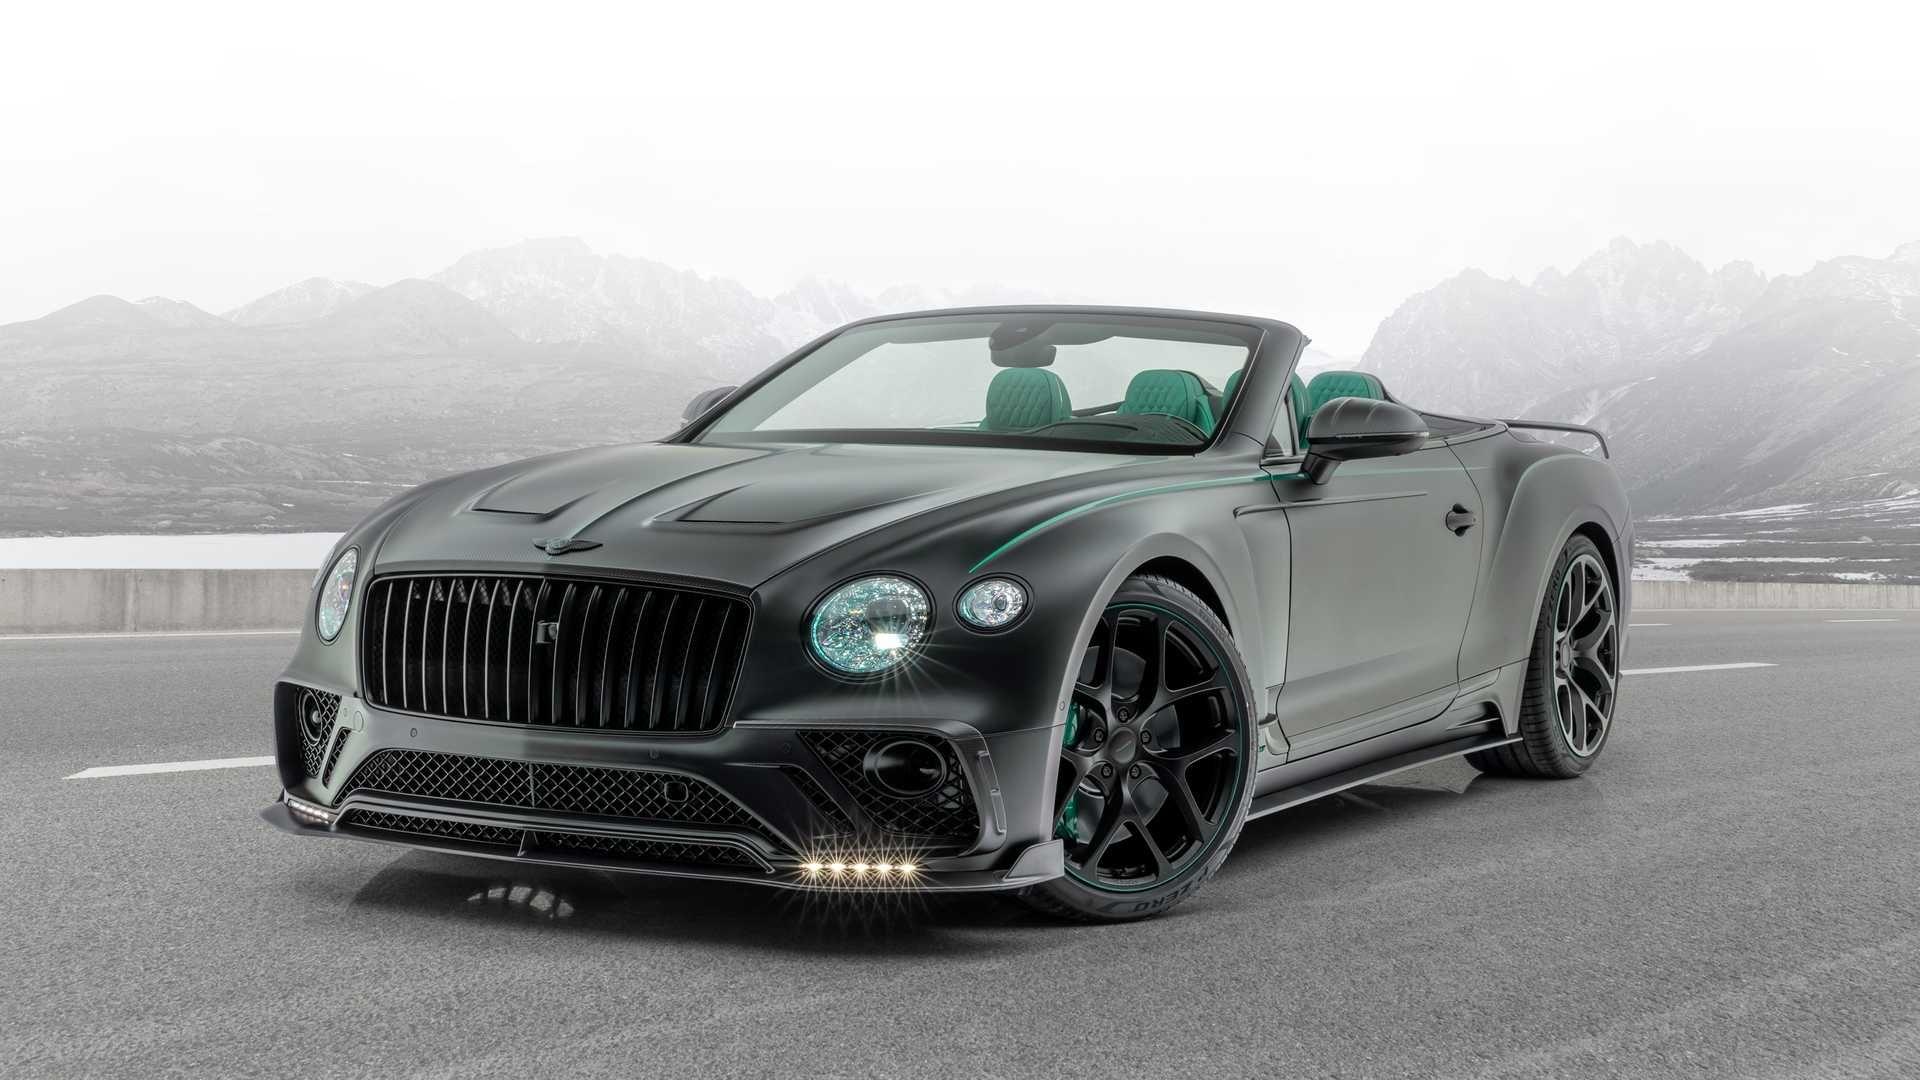 Bentley-Continental-GTC-V8-Cabriolet-Mansory-1